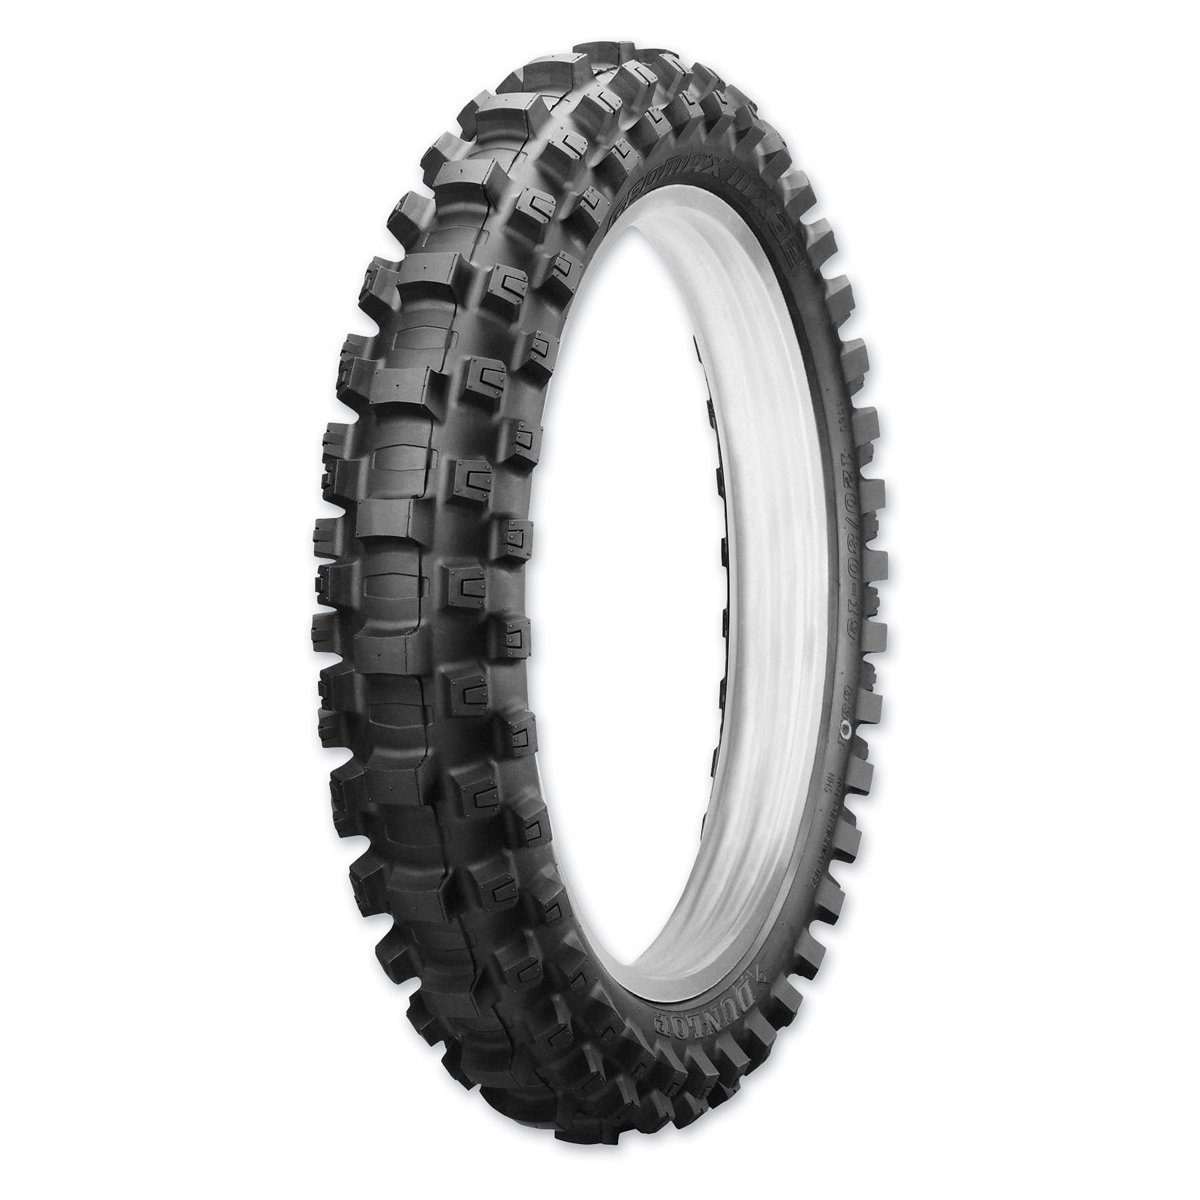 Dunlop MX3S 100/100-18 S/T-I/T Rear Tire 323S38